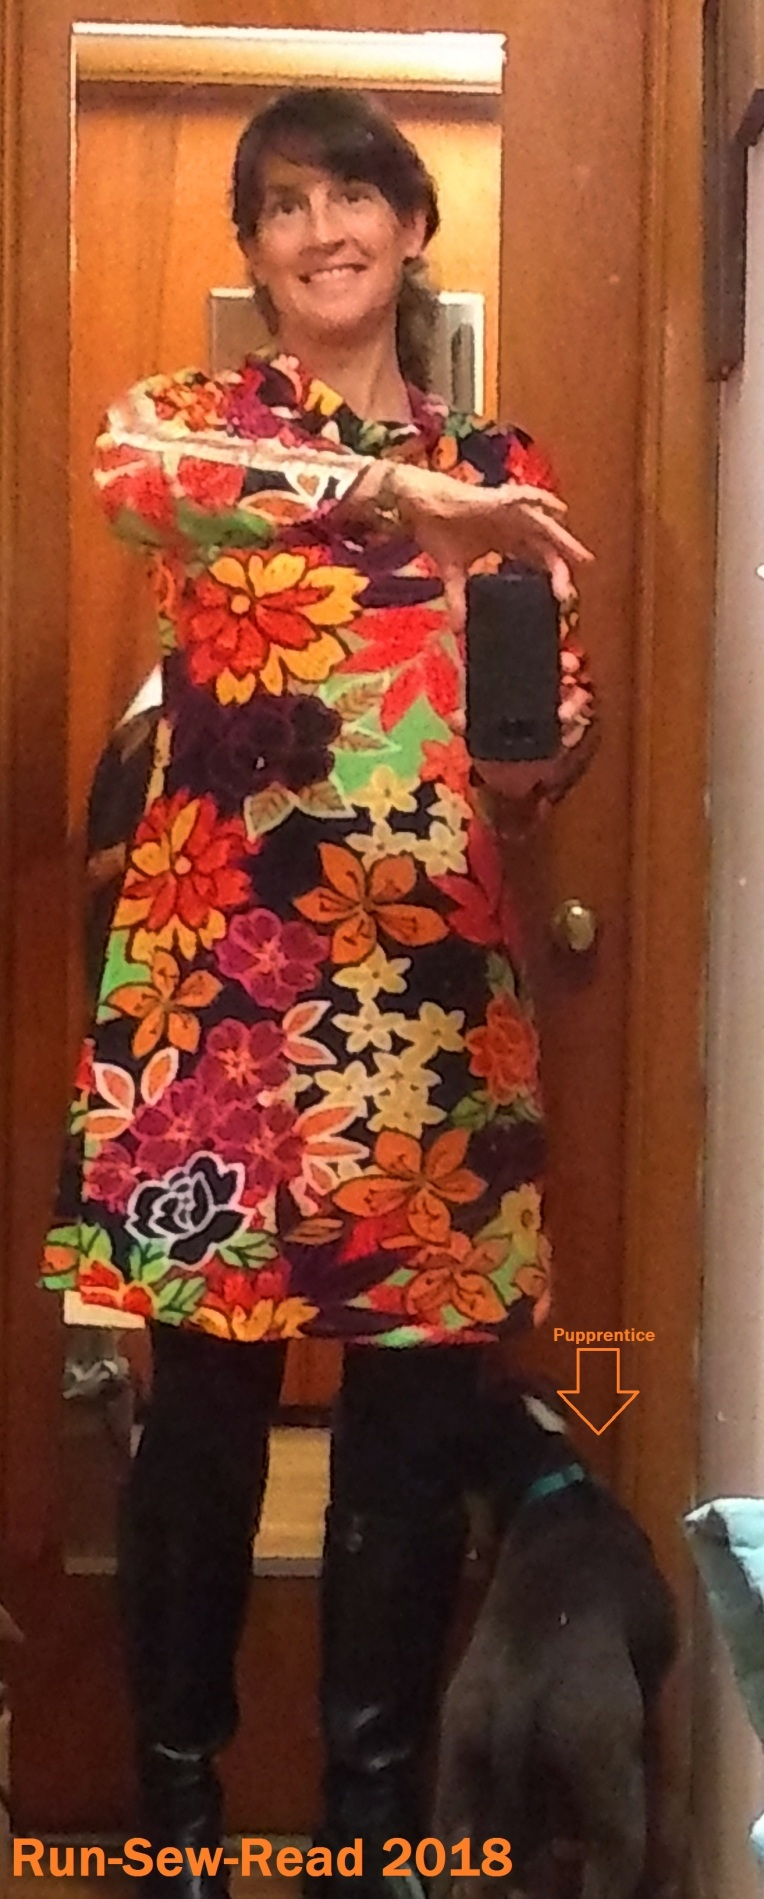 dress2 - rsr w pupprentice